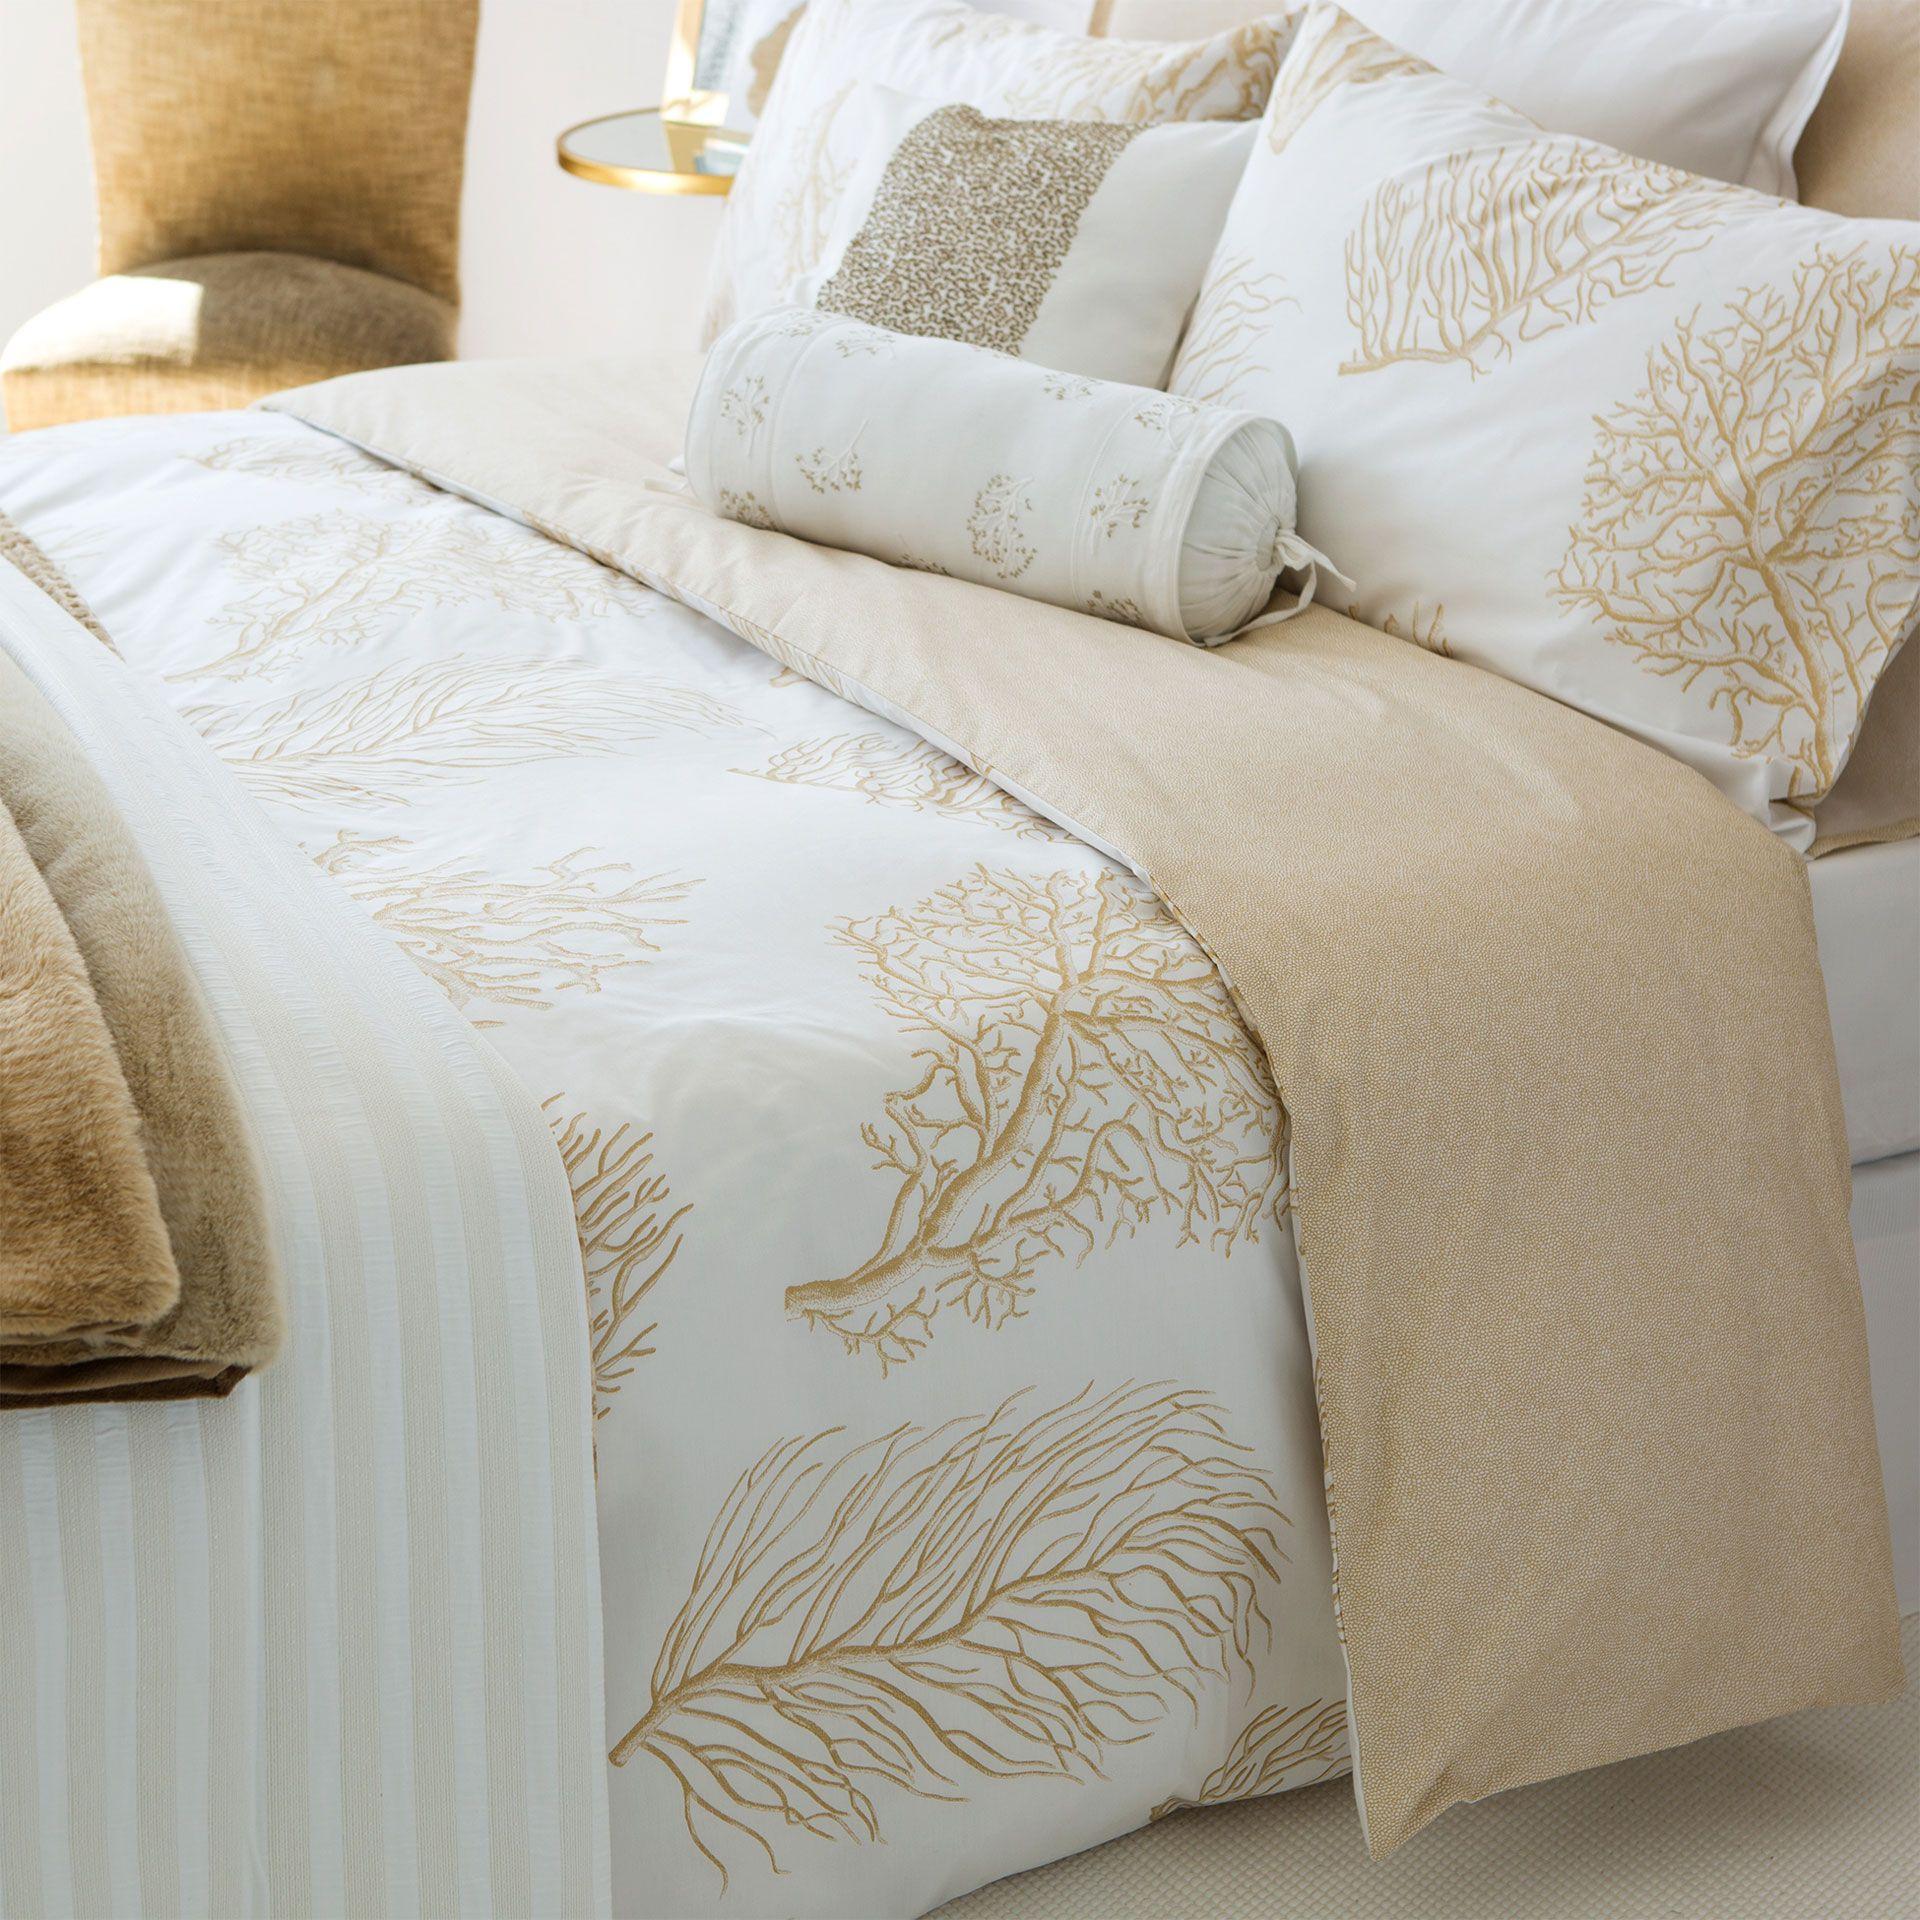 6ed88ddb5d0 Coral Print Duvet Cover - Bedroom   Zara Home Sverige / Sweden ...